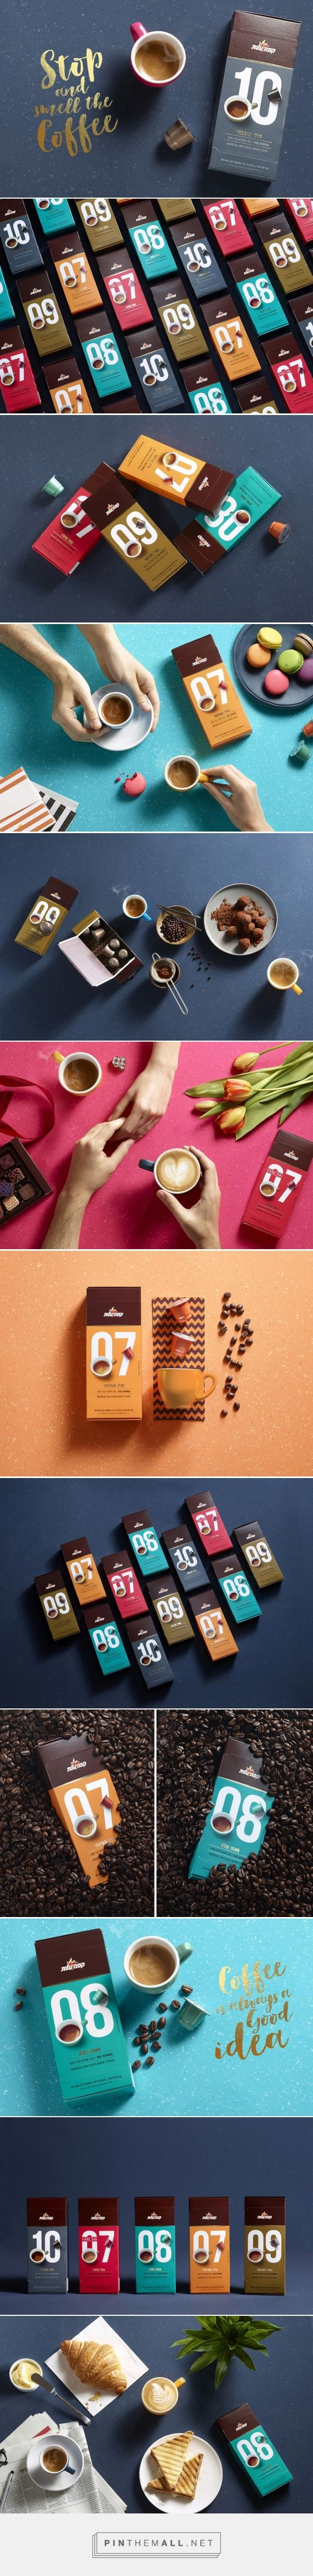 Elite Coffee Capsules packaging designed by Shake Design- Maayan Reshef מעיין…